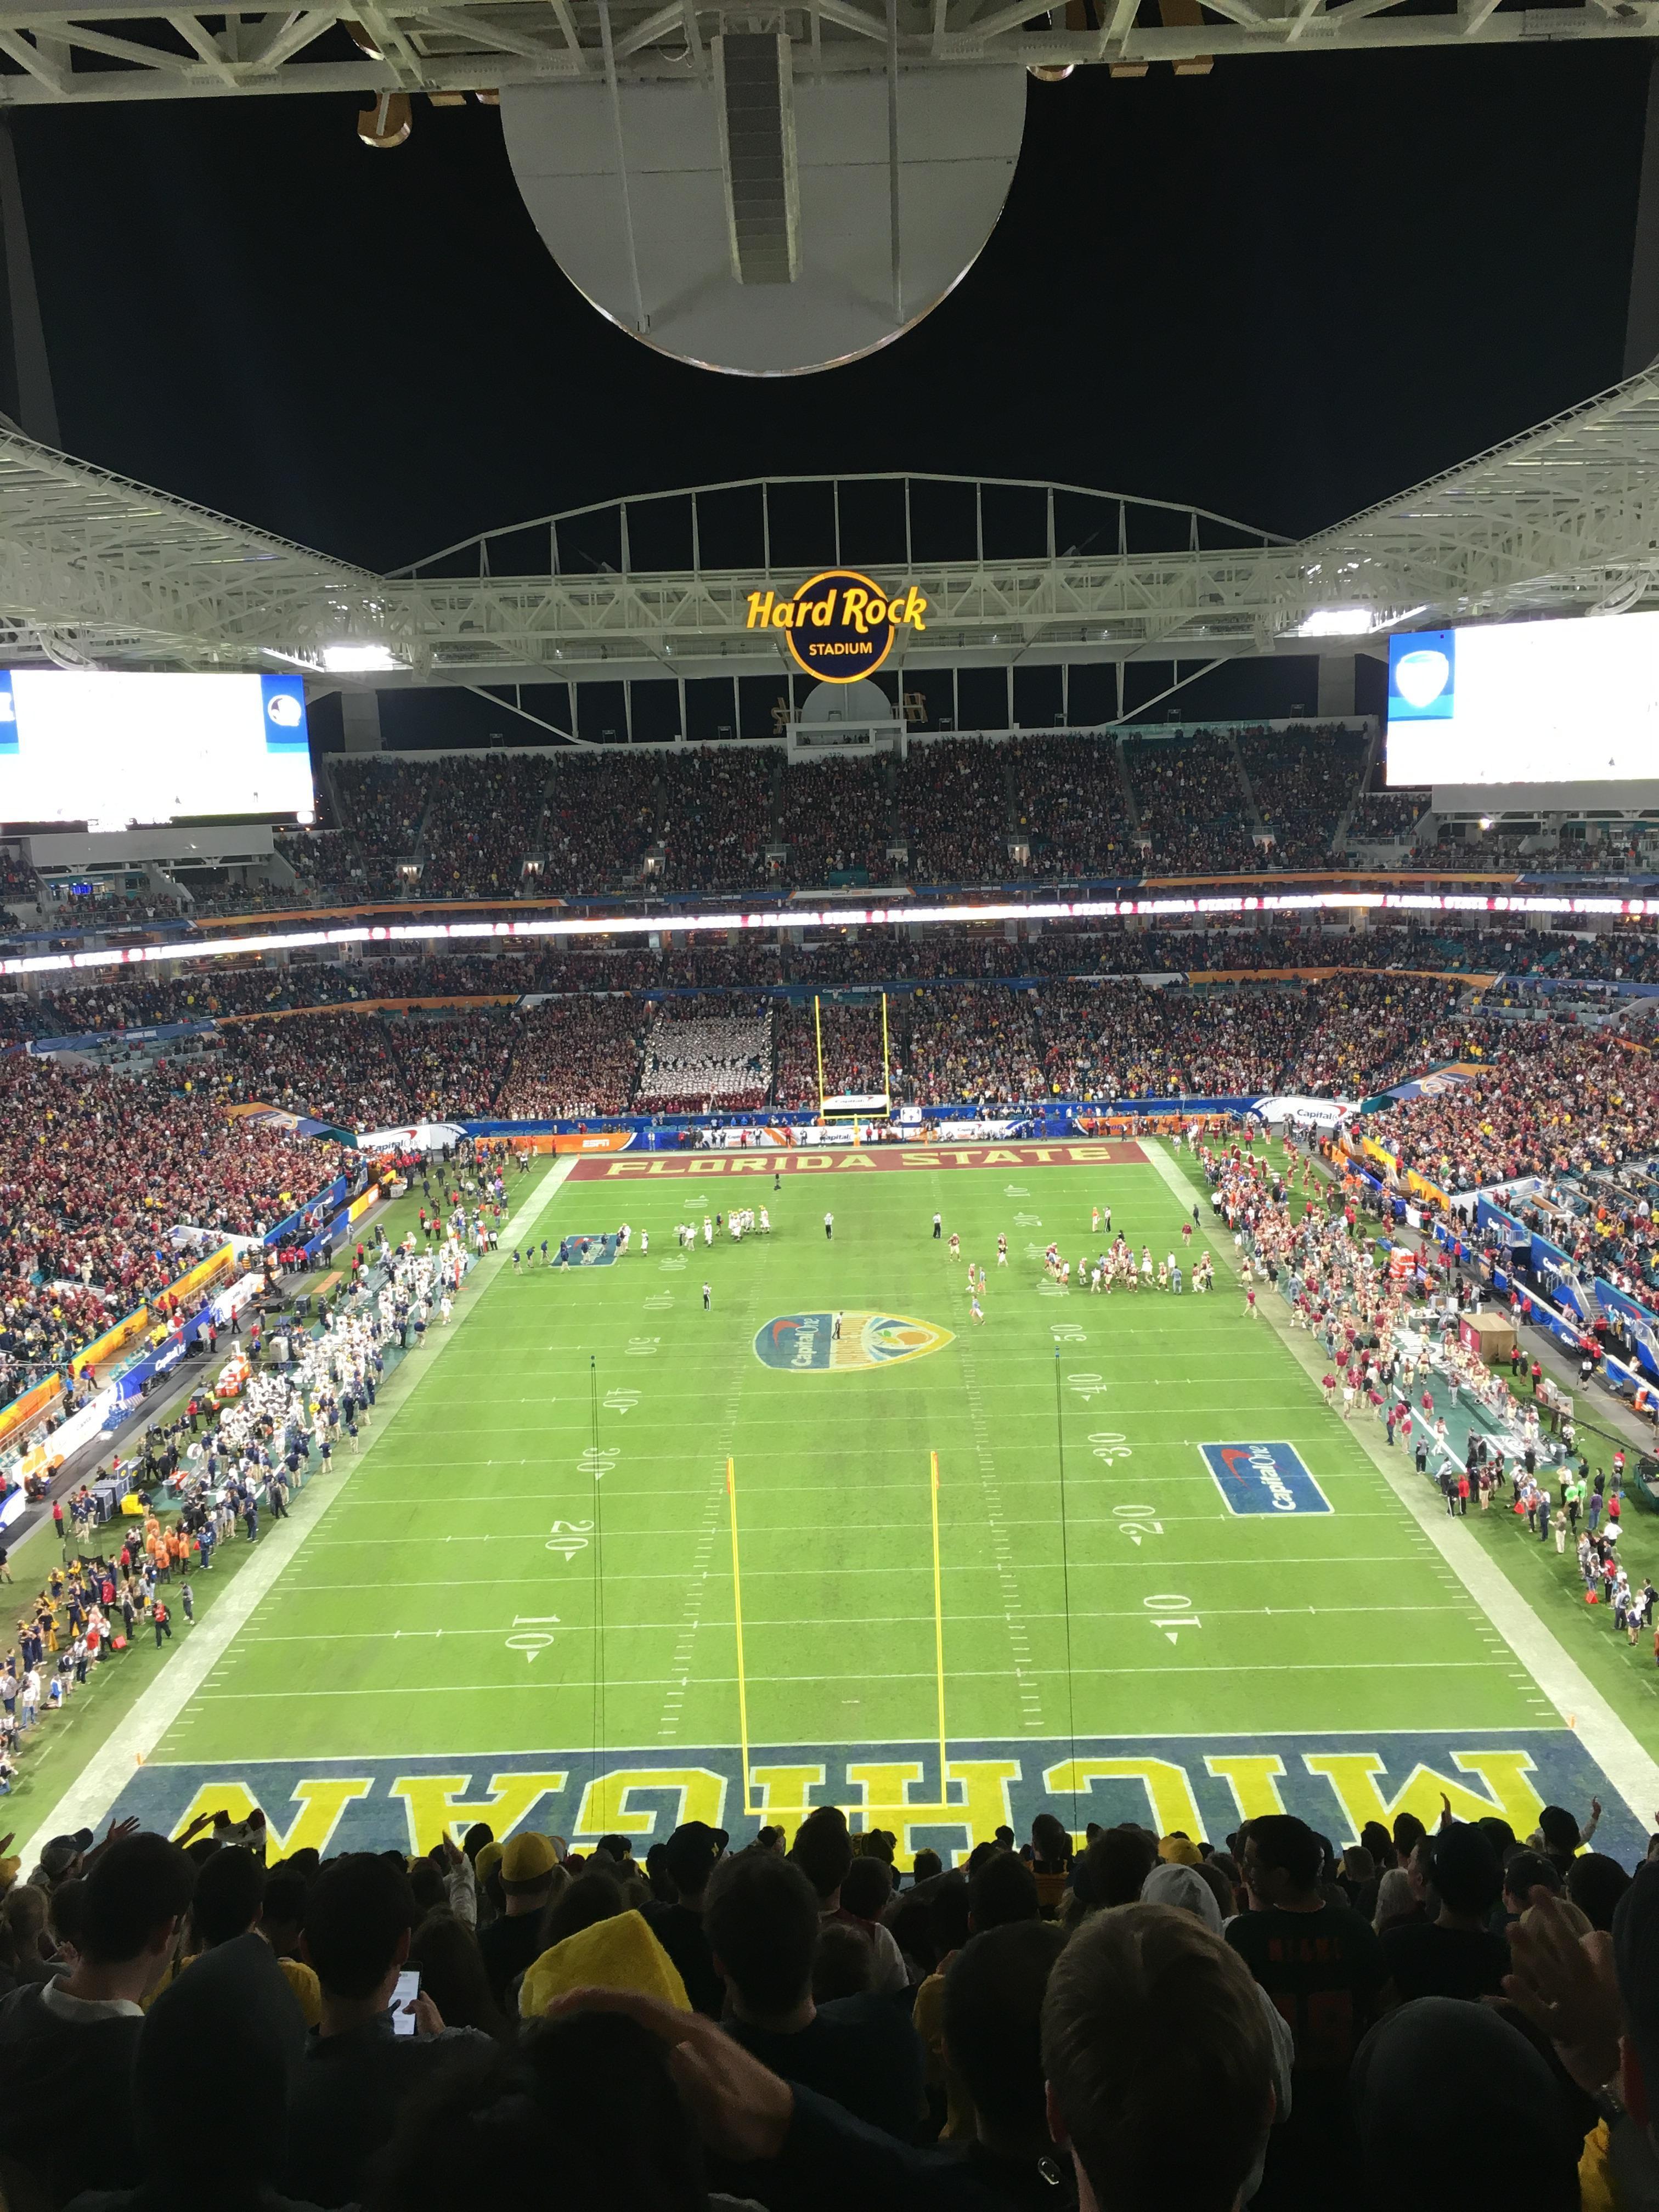 Hard Rock Stadium Section 304 Row 24 Seat 10